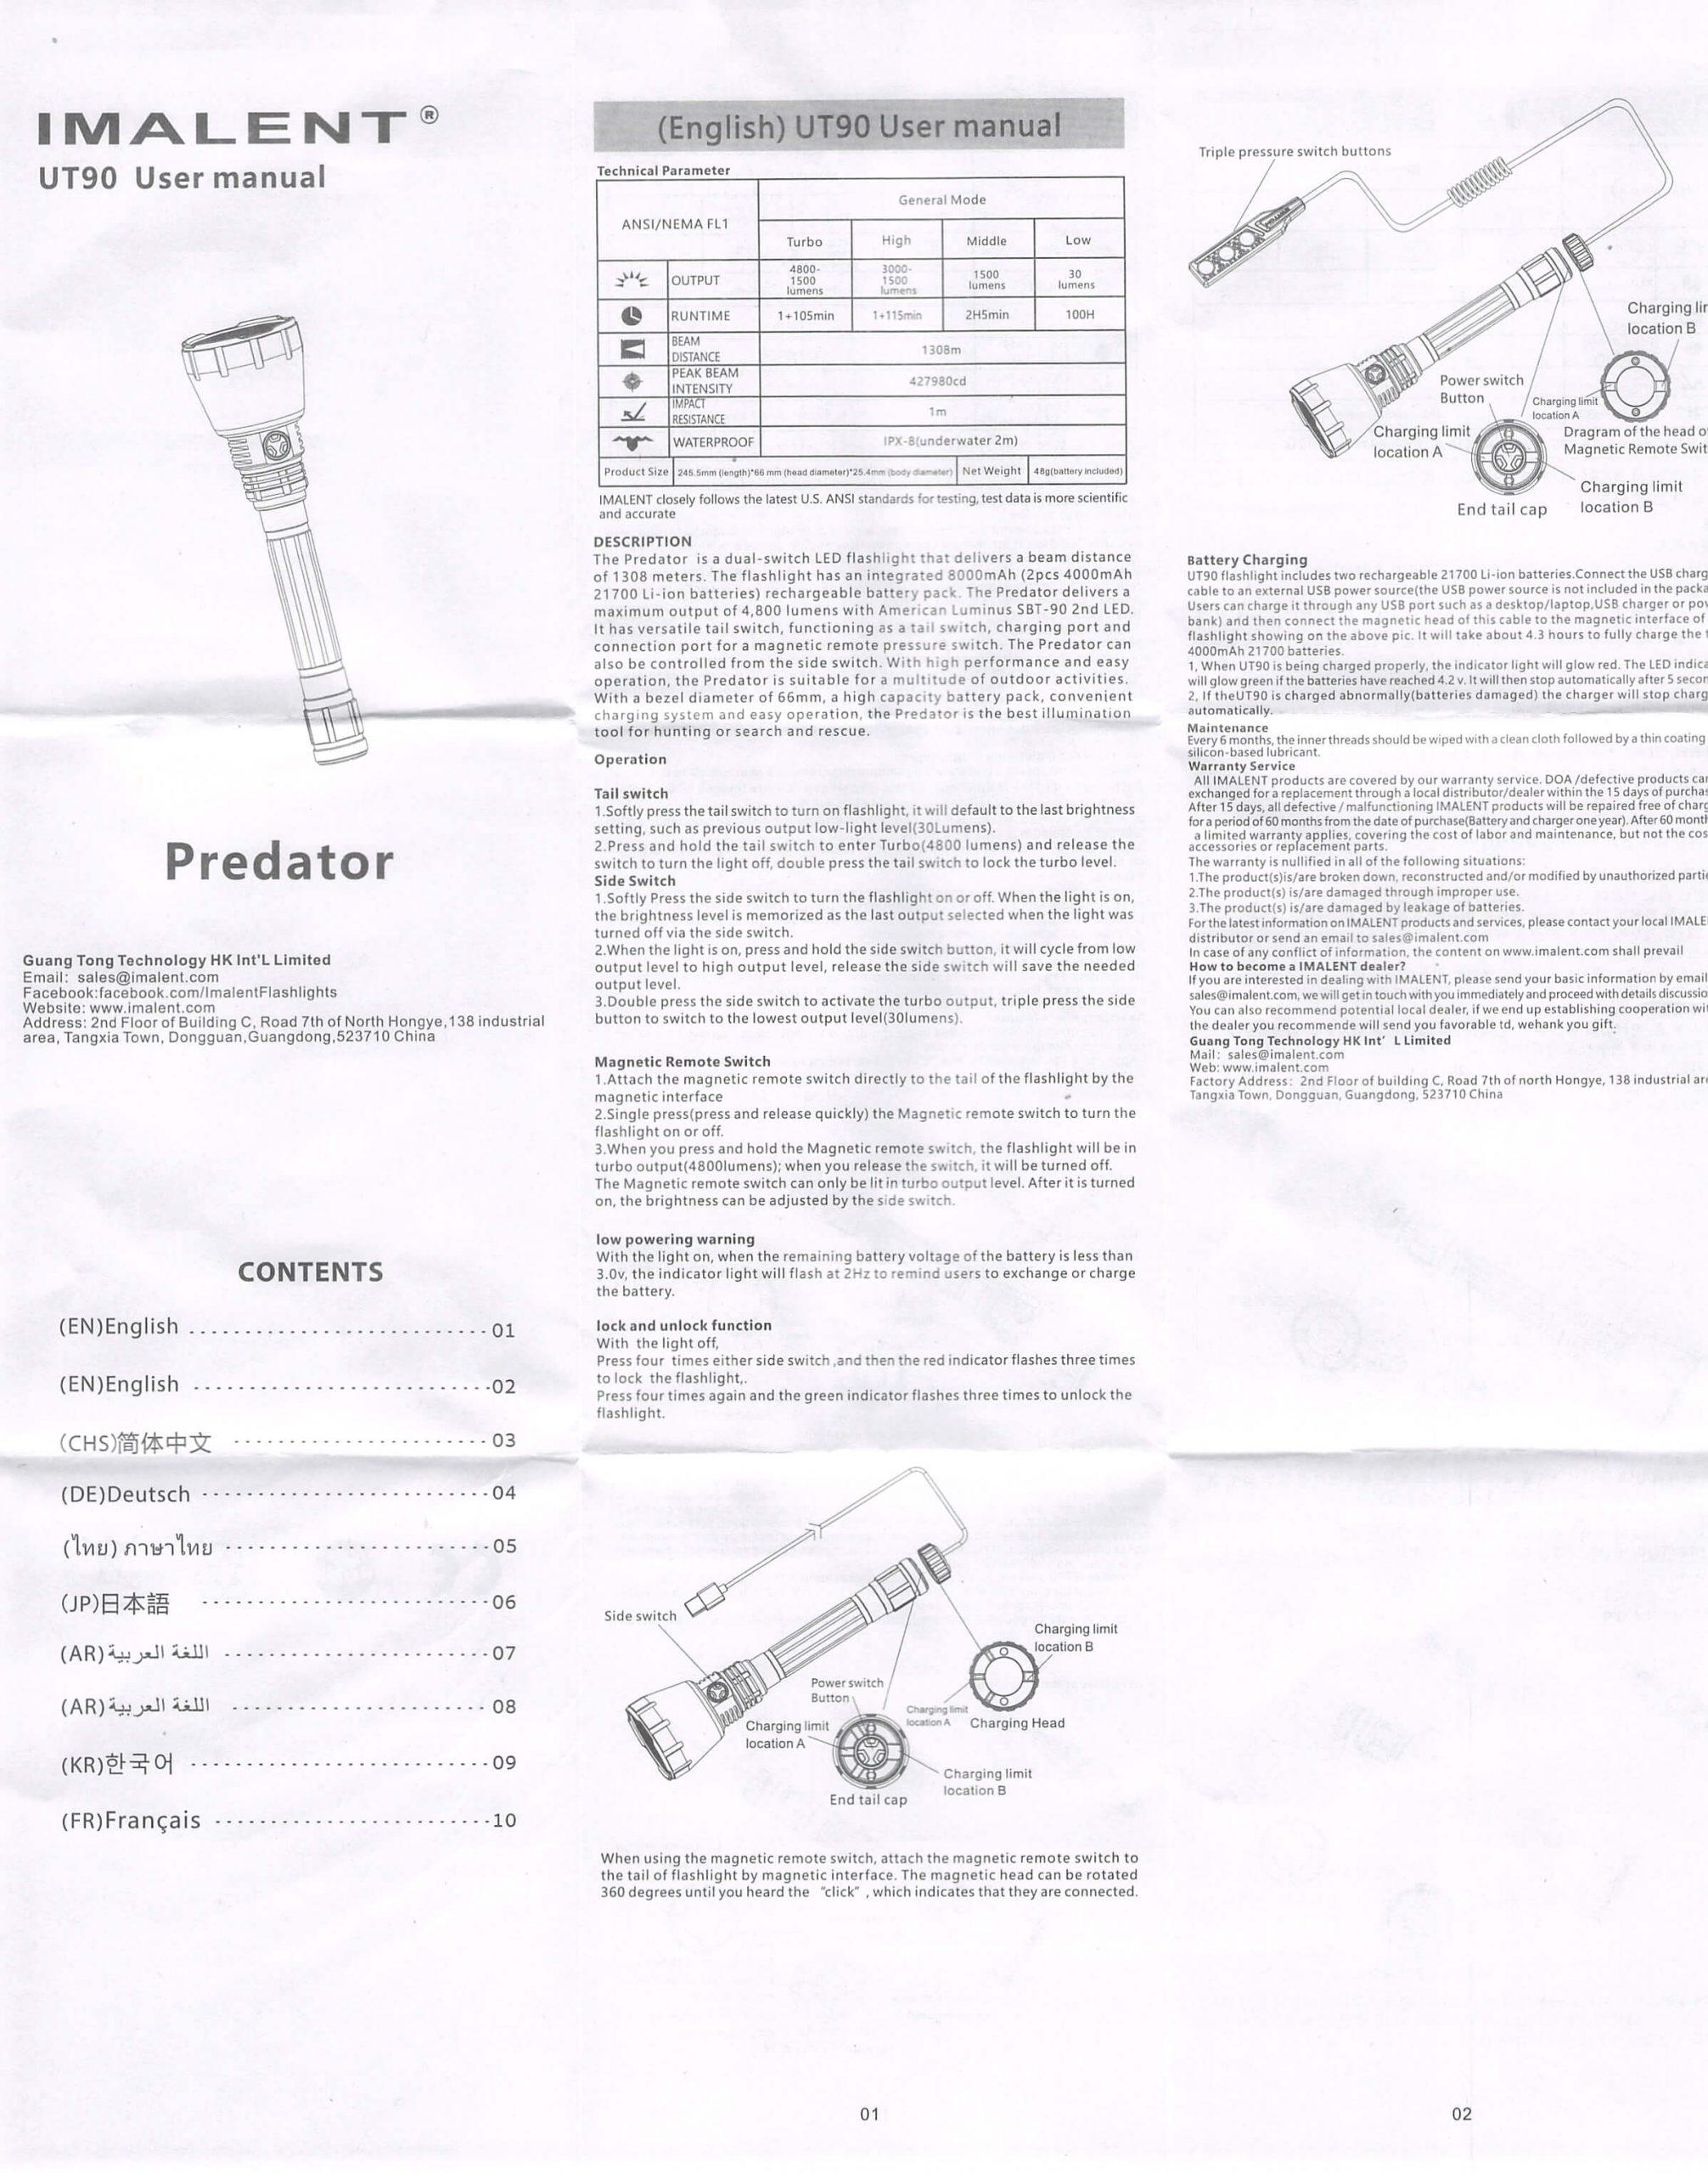 imalent ut90 manual